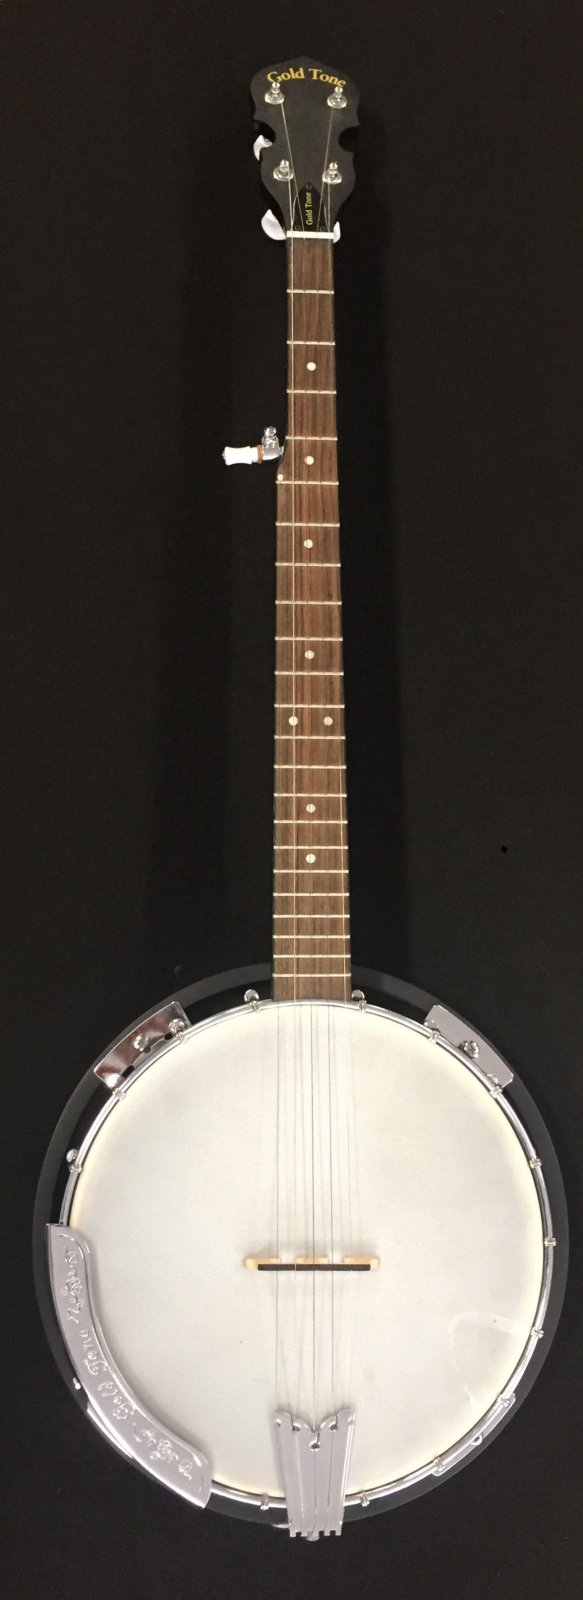 Gold Tone cripple creek resonator banjo